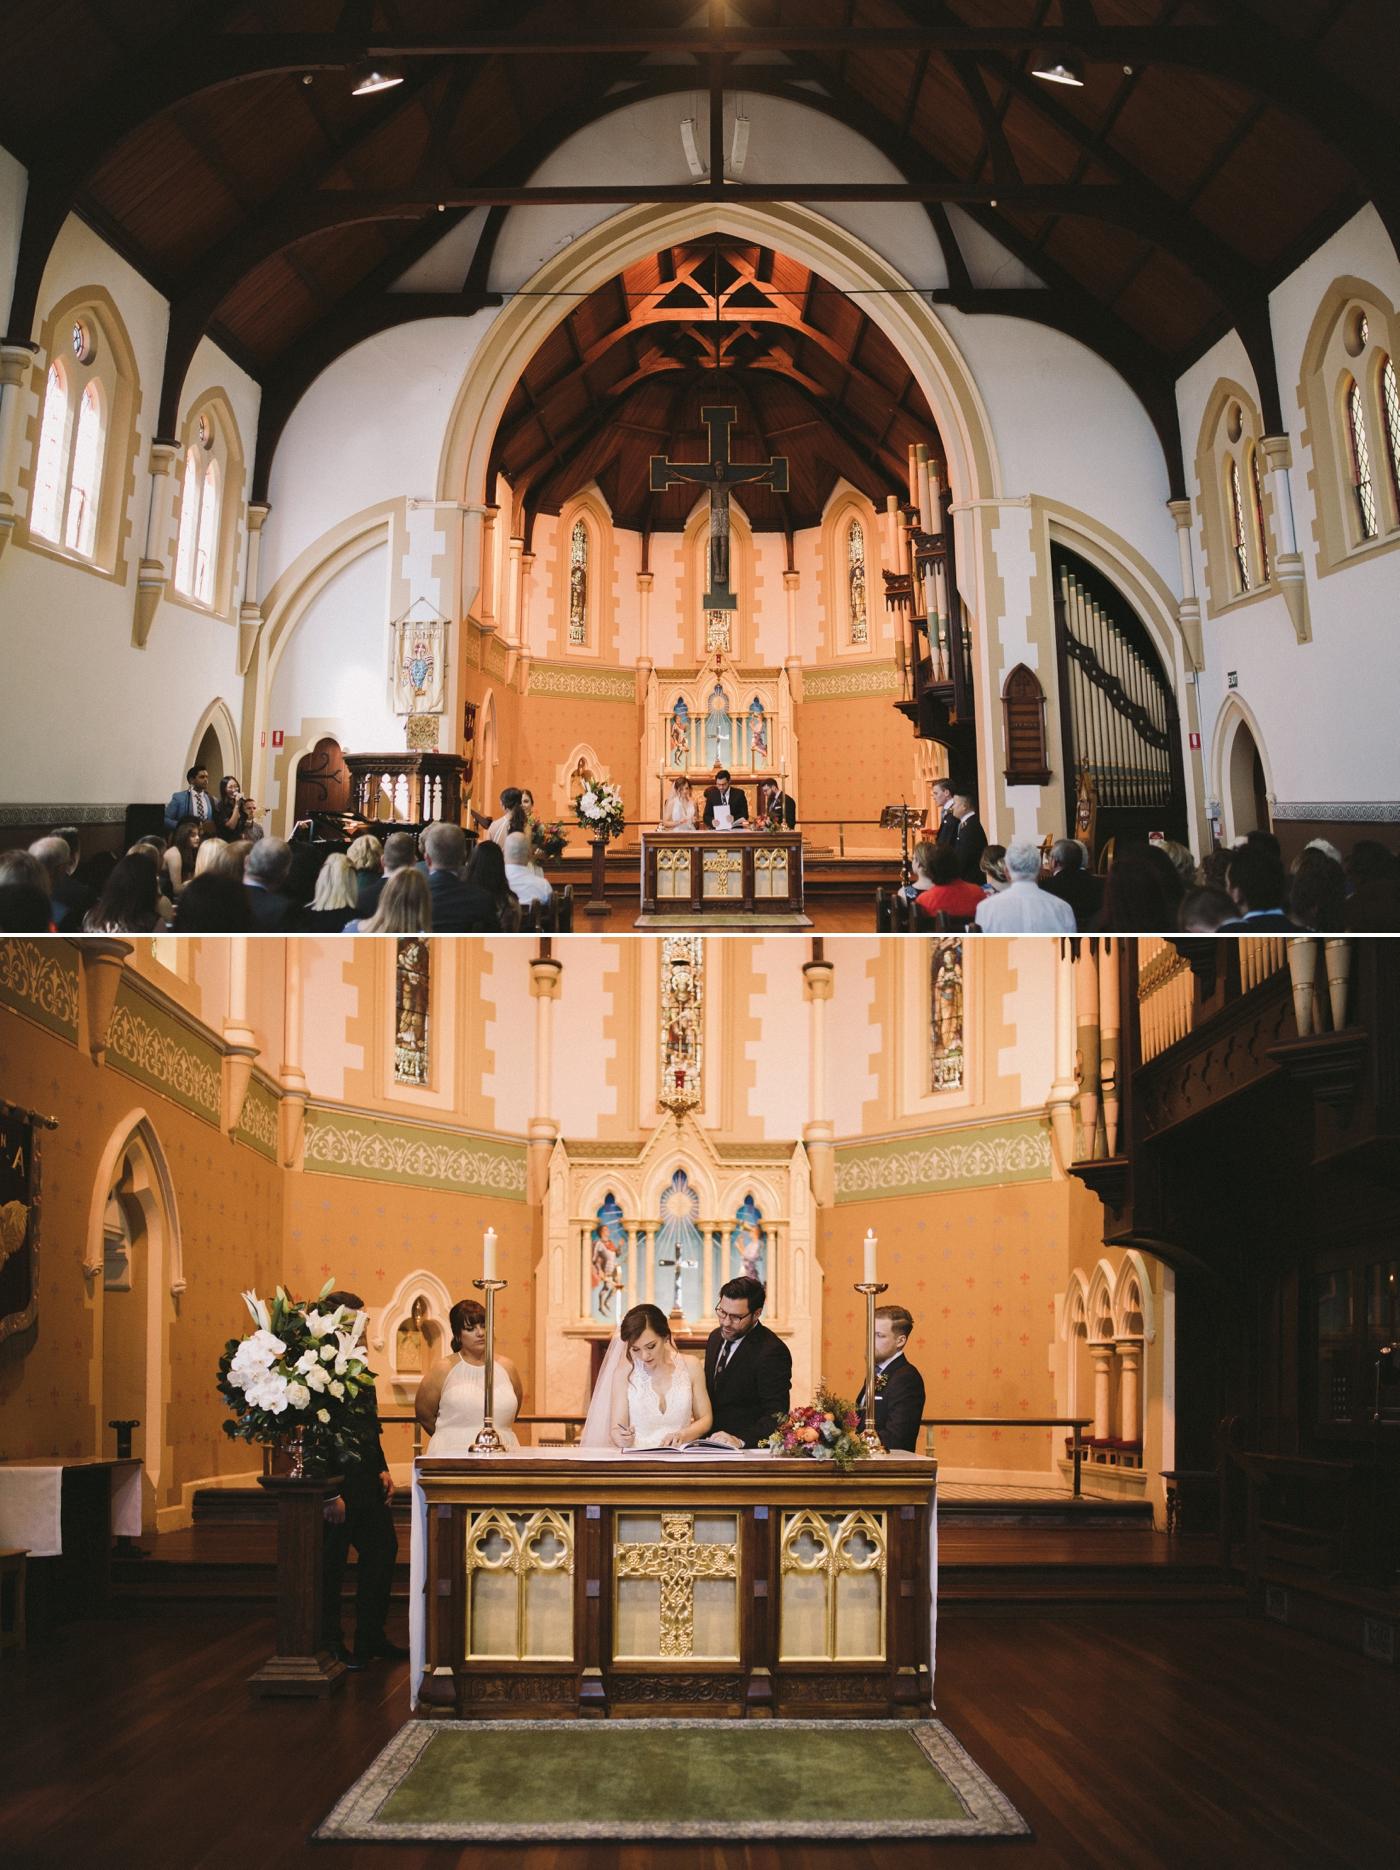 Erin & Ryan - Natural Wedding Photographer in Adelaide - Maximillians Wedding - Simple and Modern Wedding Photographer - Katherine Schultz - www.katherineschultzphotography.com_0025.jpg